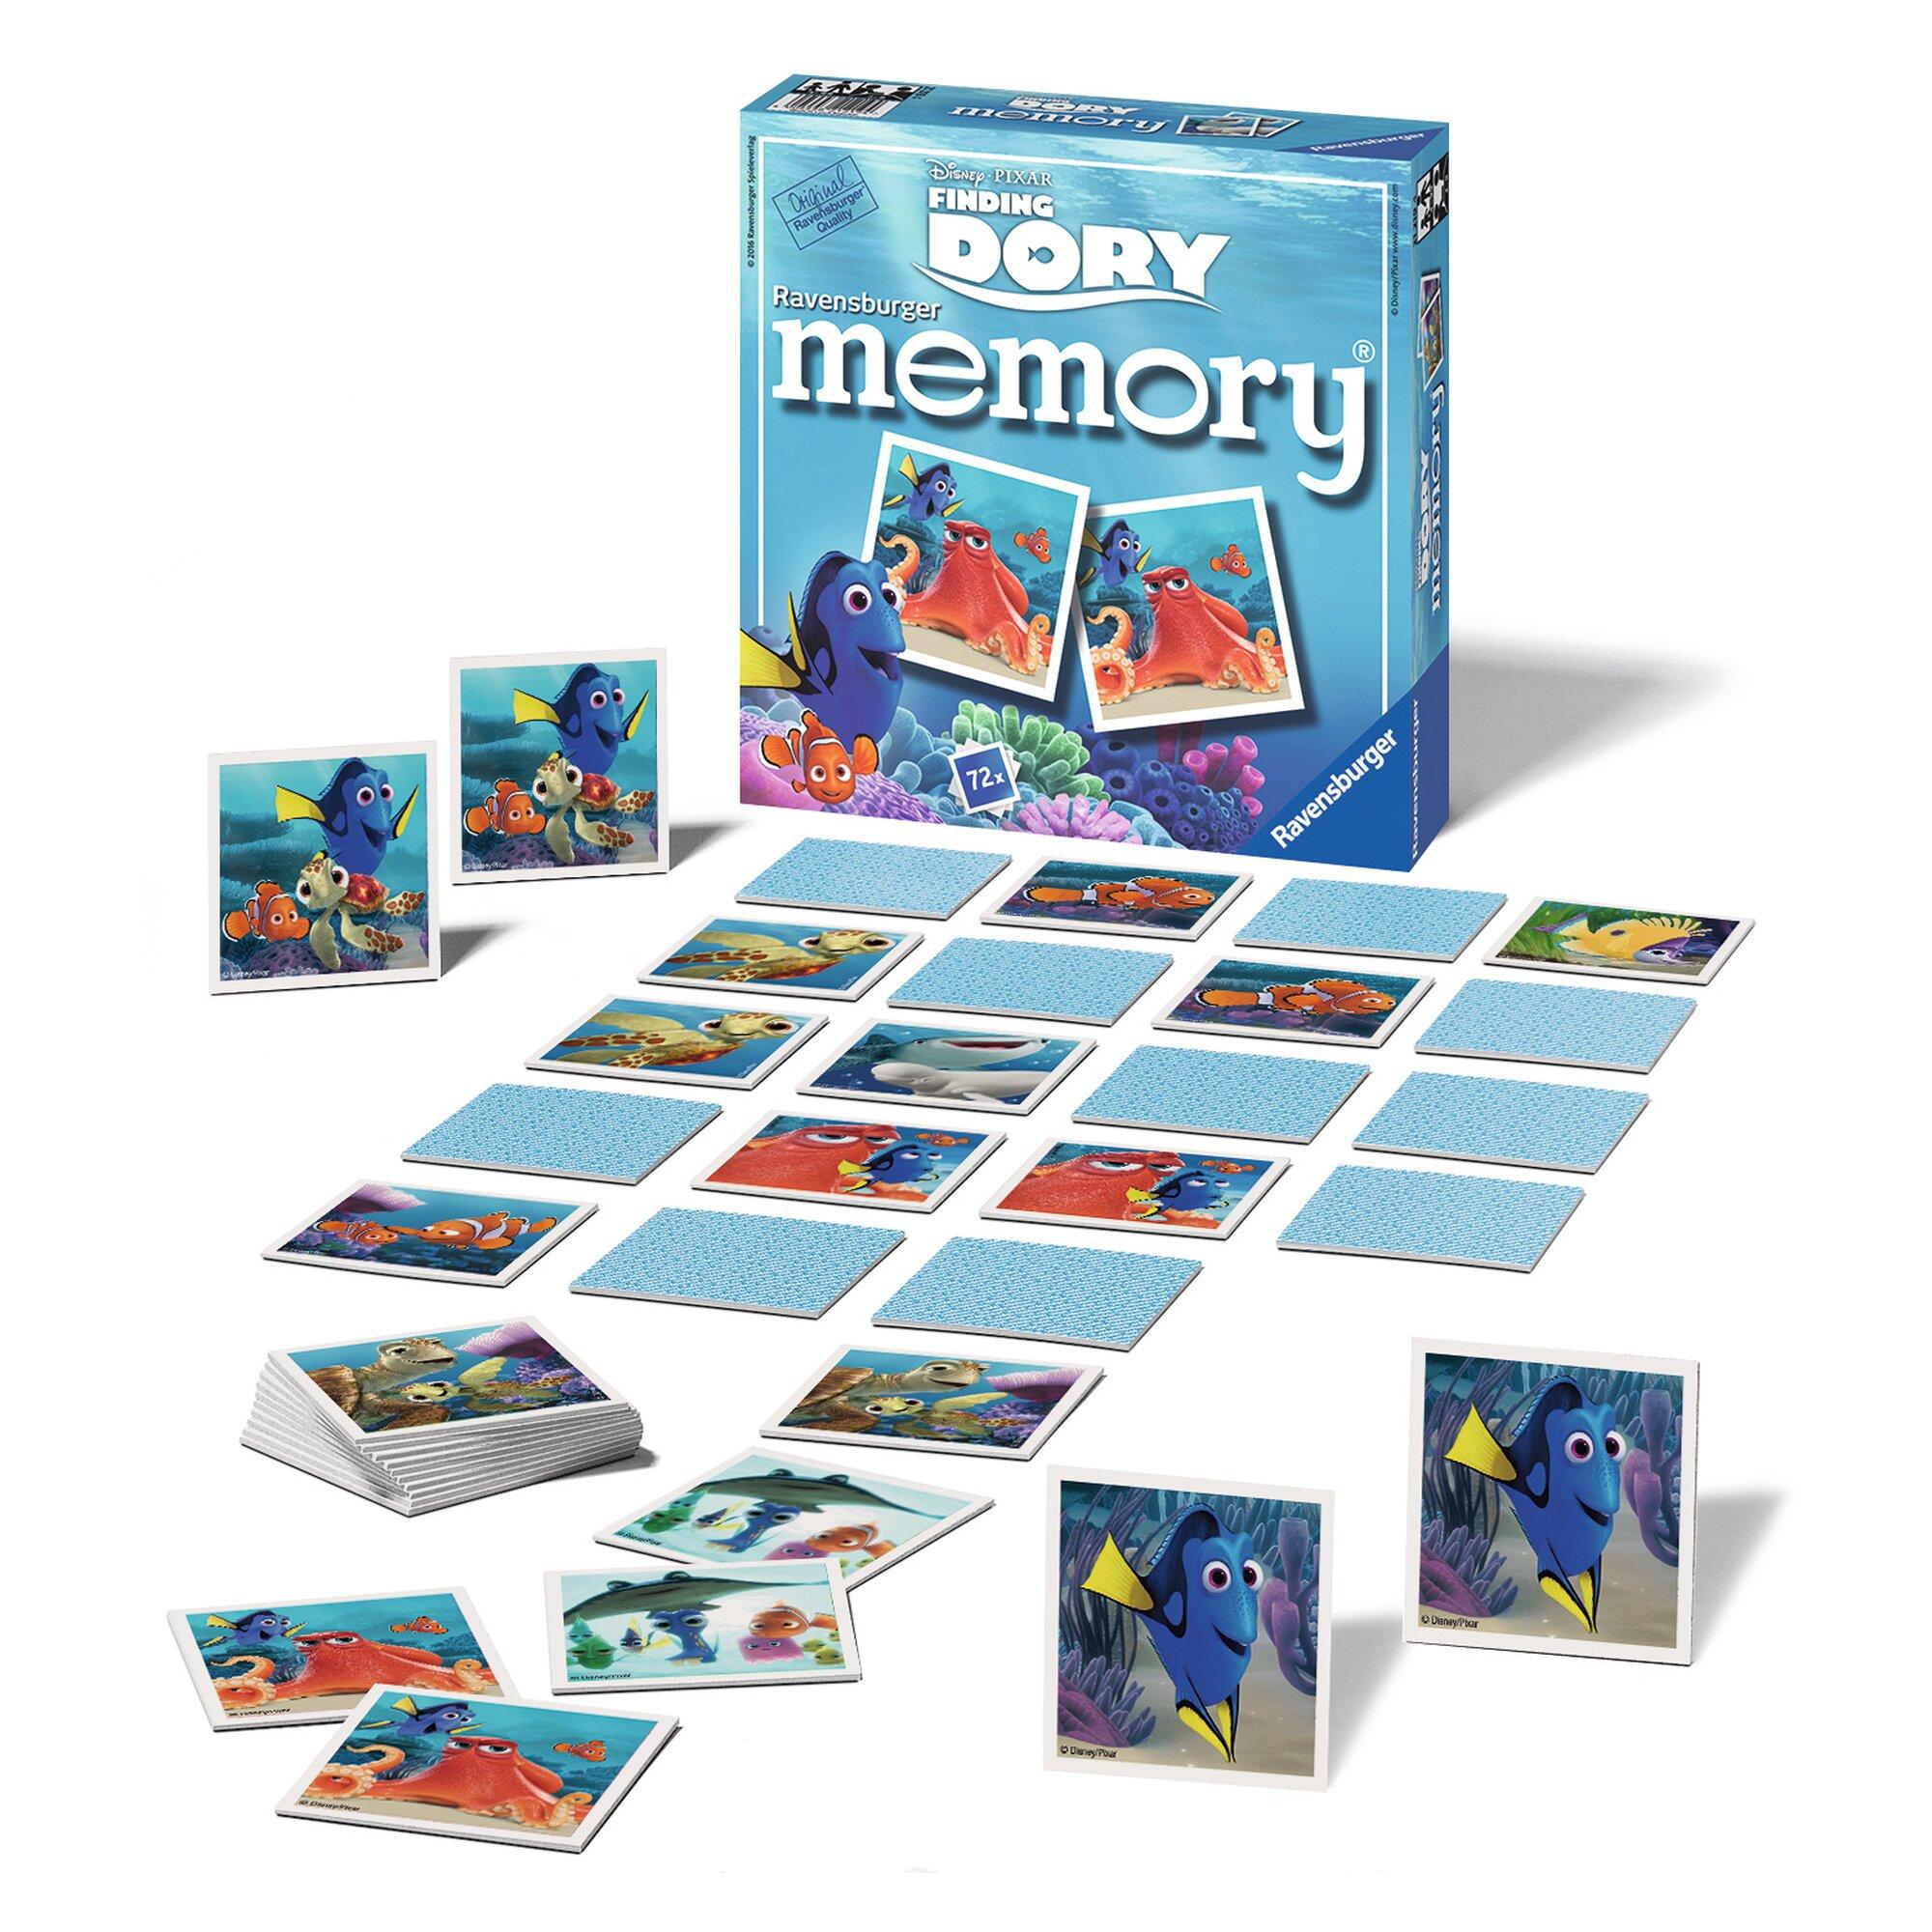 ravensburger-disney-pixar-finding-dory-memory-legekartenspiel